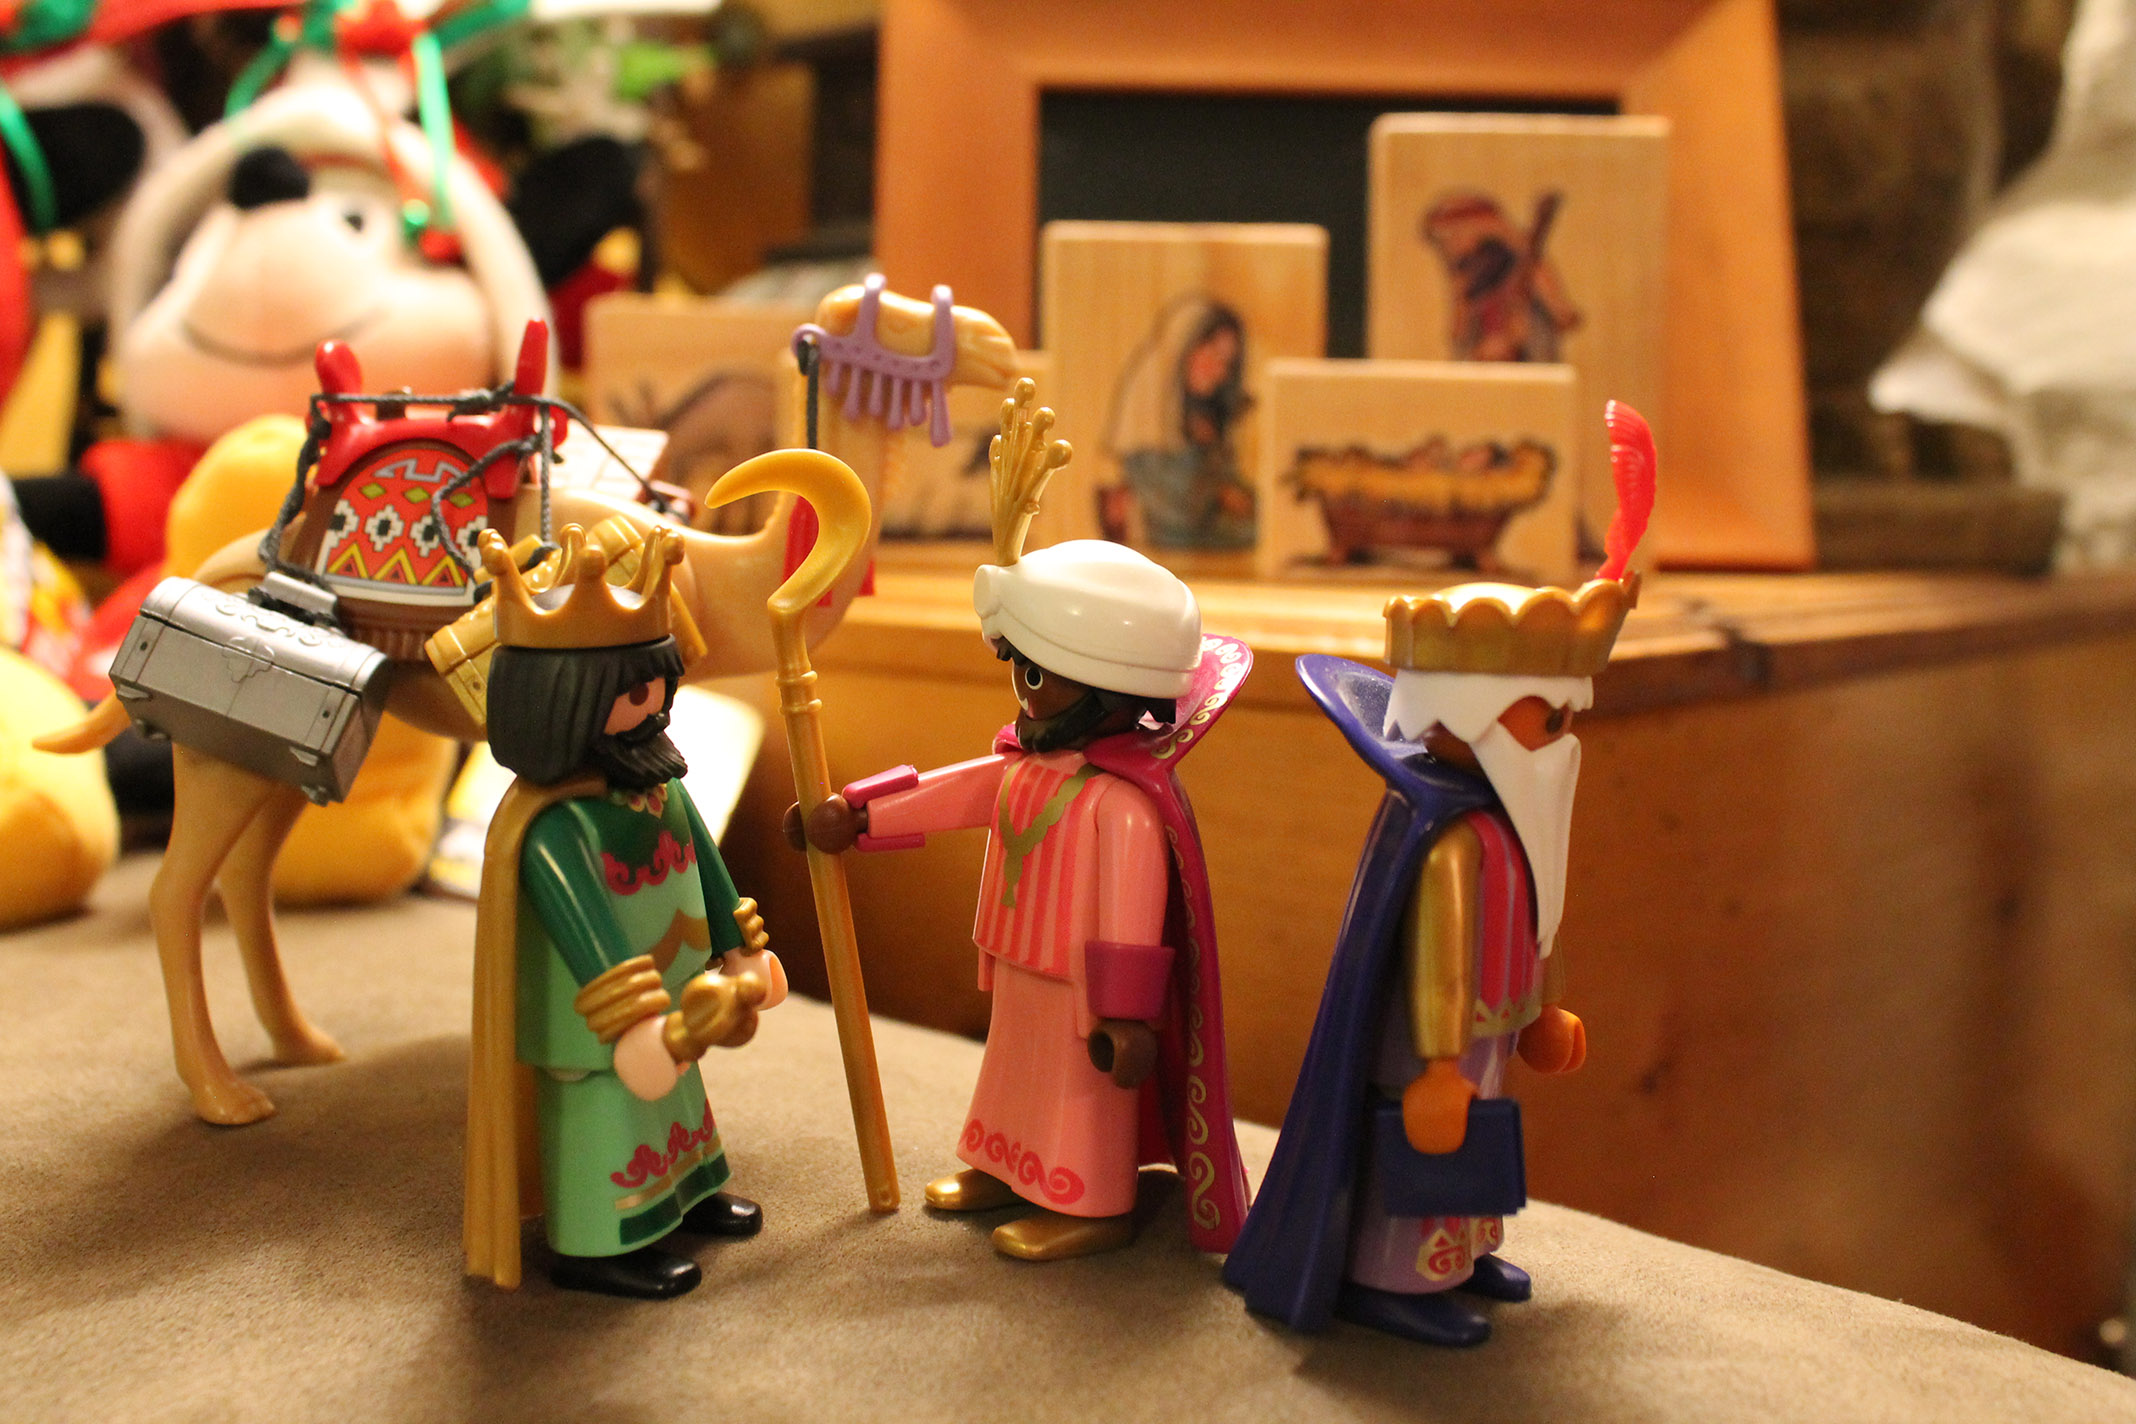 Three wisemen and a wooden manger behind them.